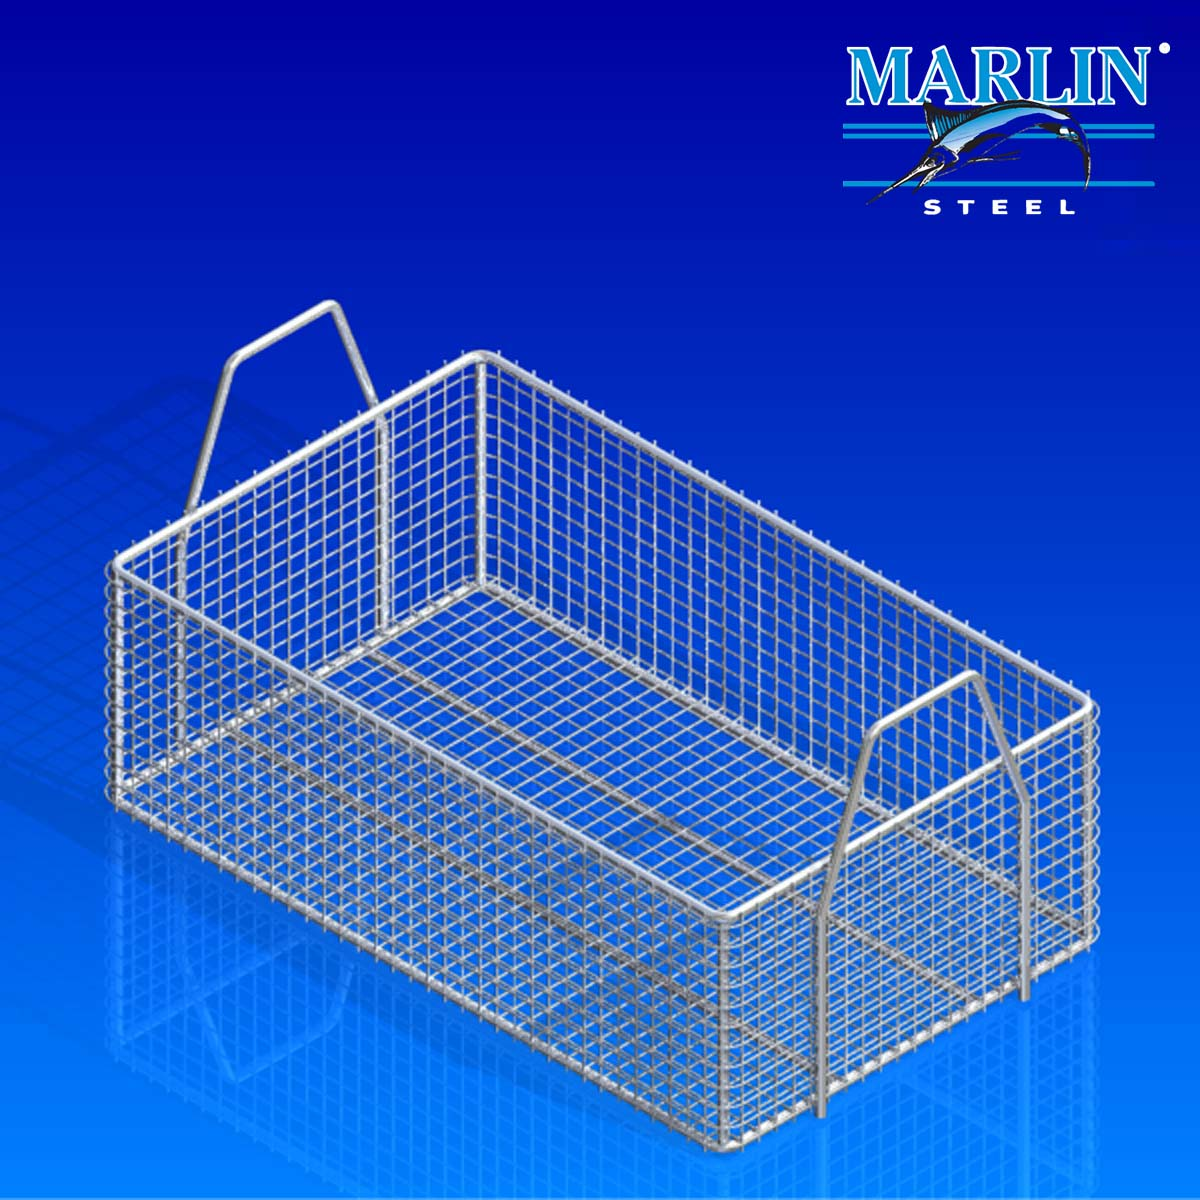 Marlin Steel Basket with Handles 659002